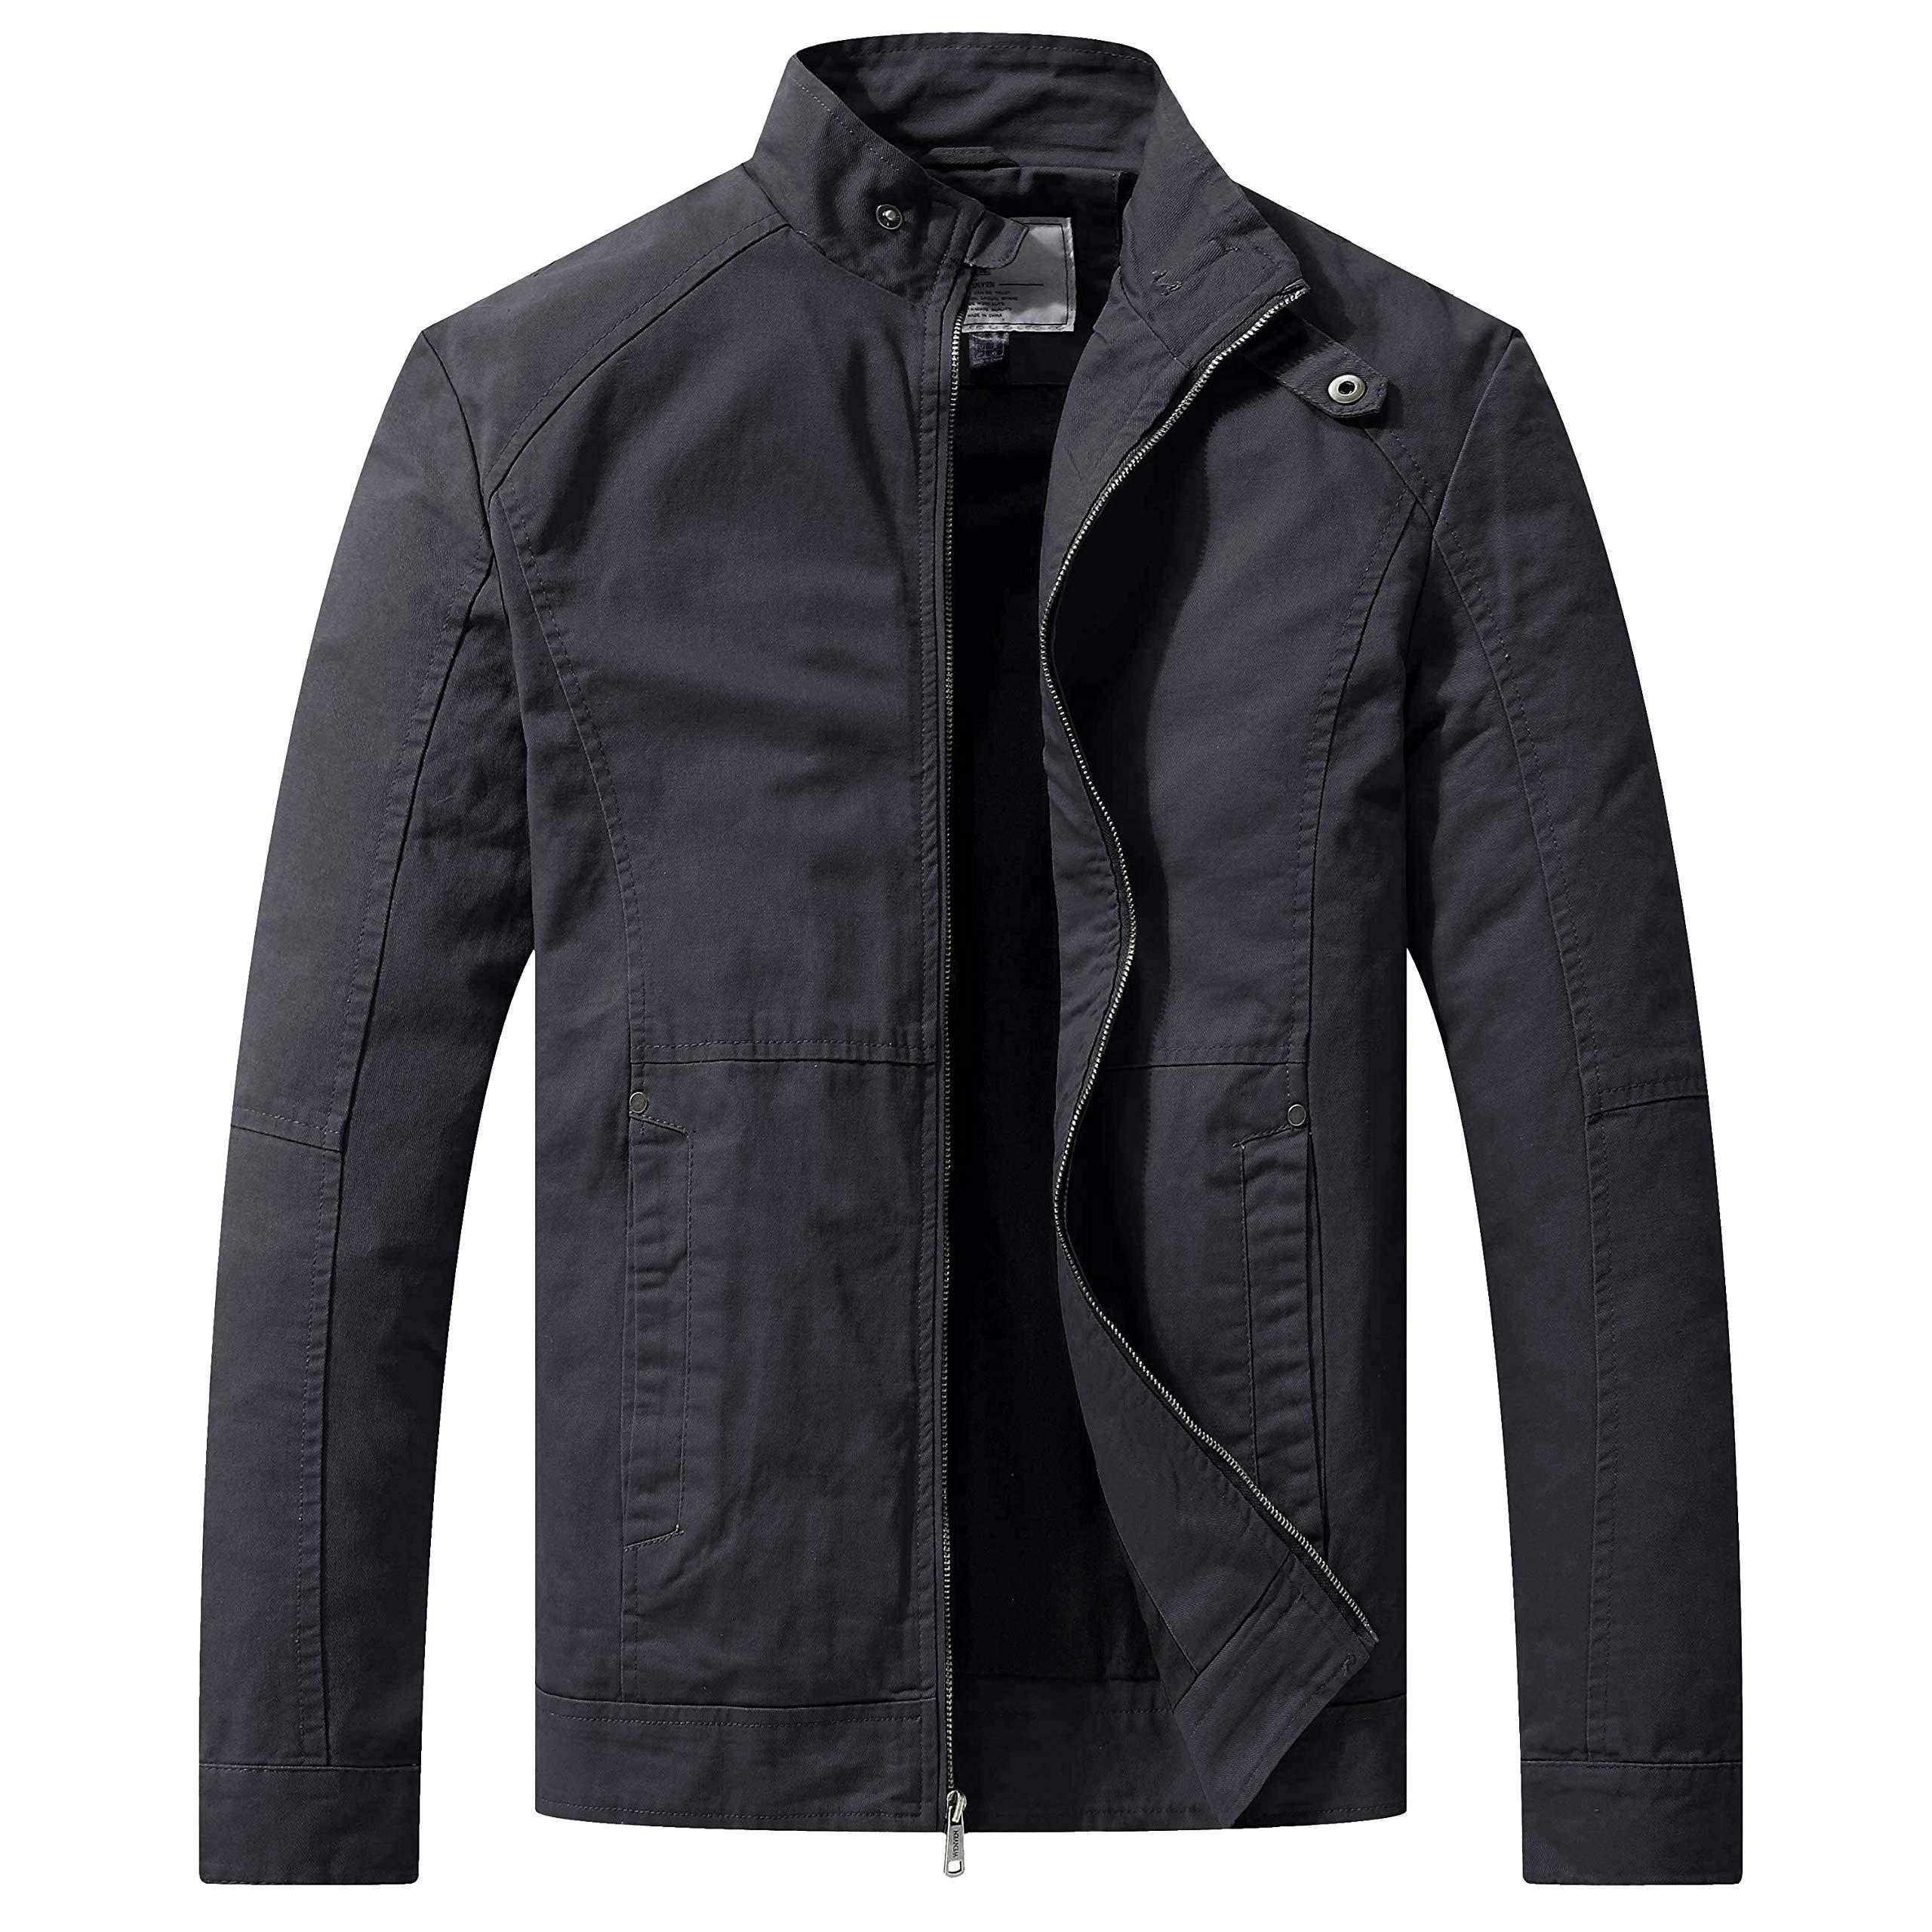 WenVen Men's Warm Casual Full Zip Military Jacket(Gray,L) by WenVen